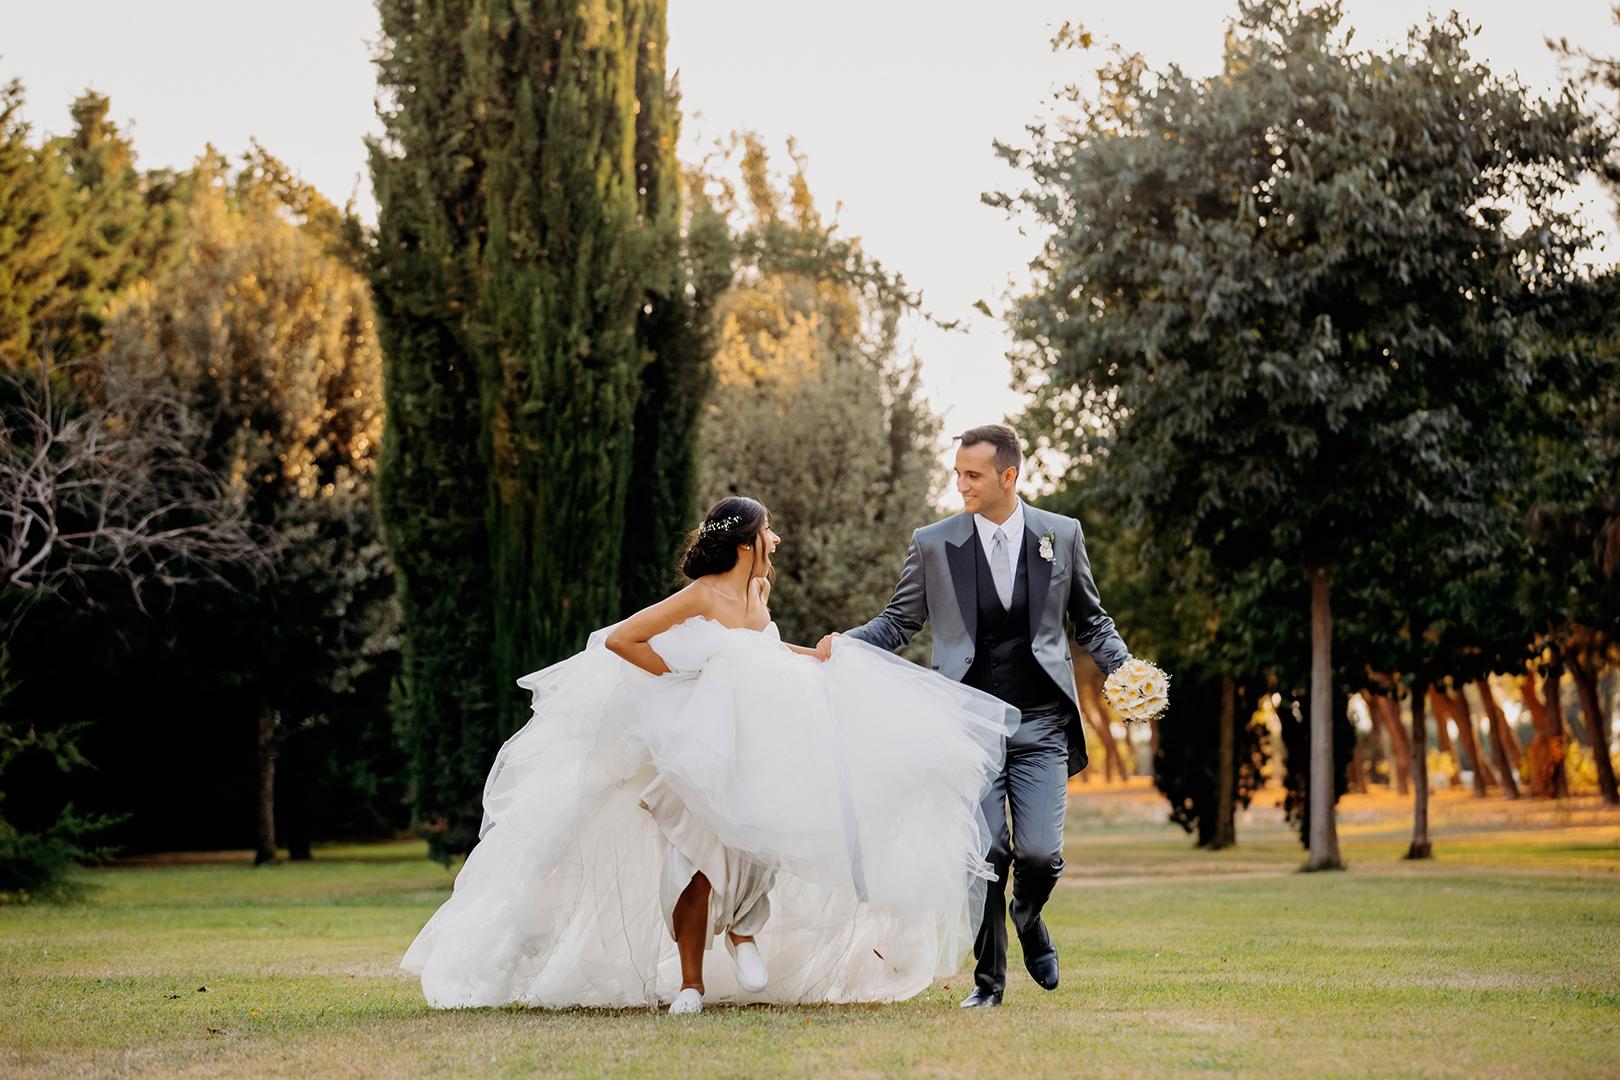 65 gianni-lepore-fotografo-wedding-matrimonio-sposi-torre-andriana-bride-groom-esterni-corsa